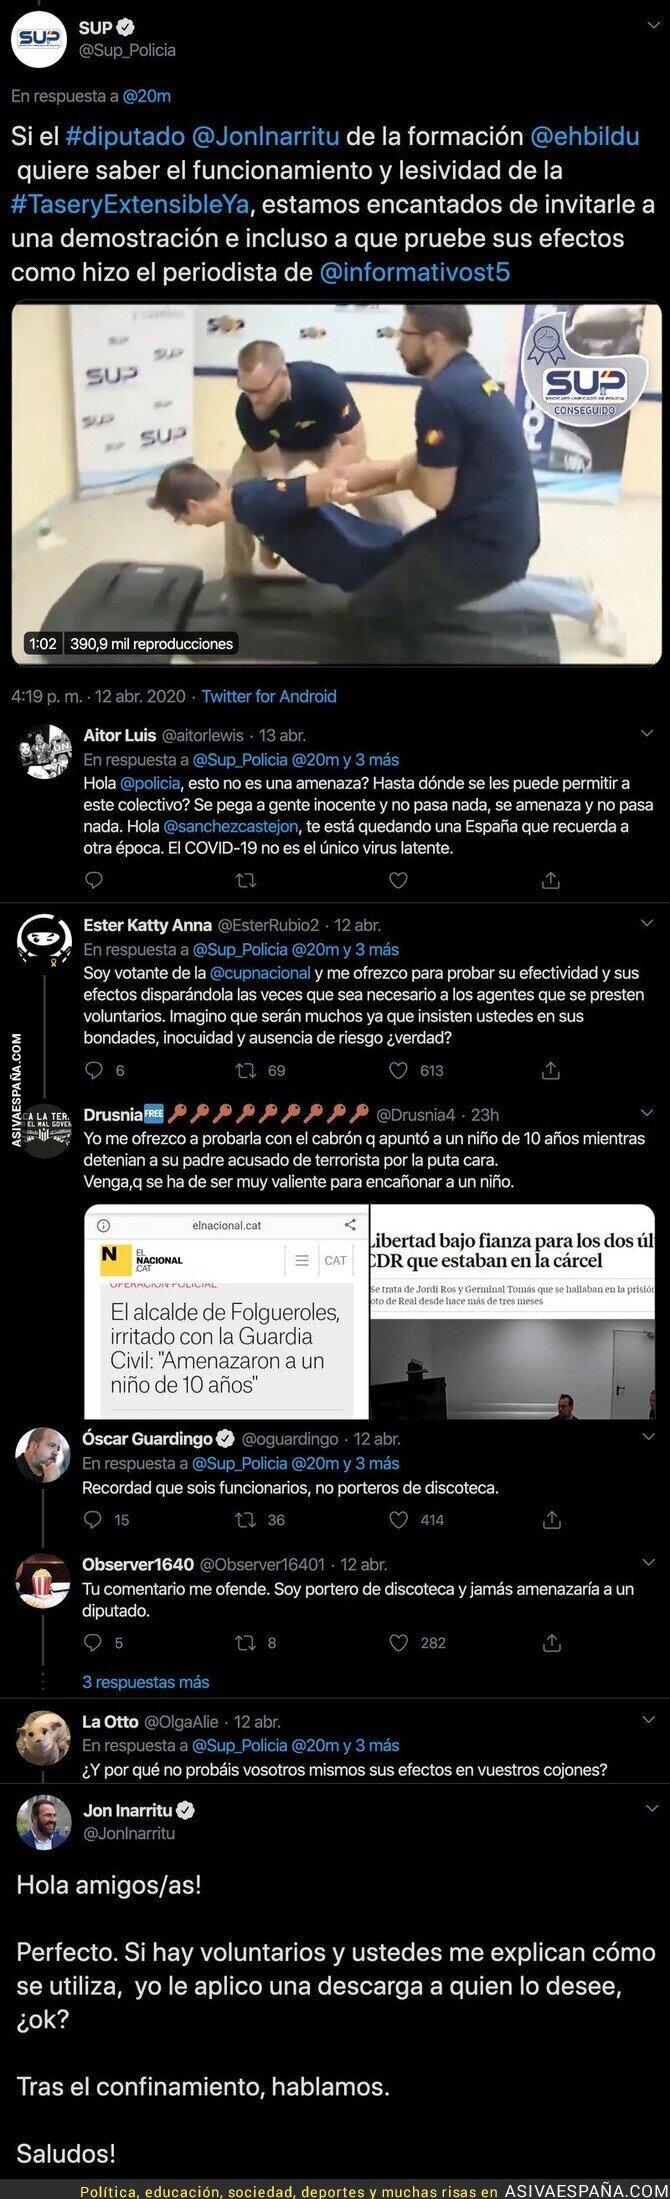 143810 - Tremendo: un sindicato policial amenaza con disparar al diputado Jon Iñarritu con este mensaje